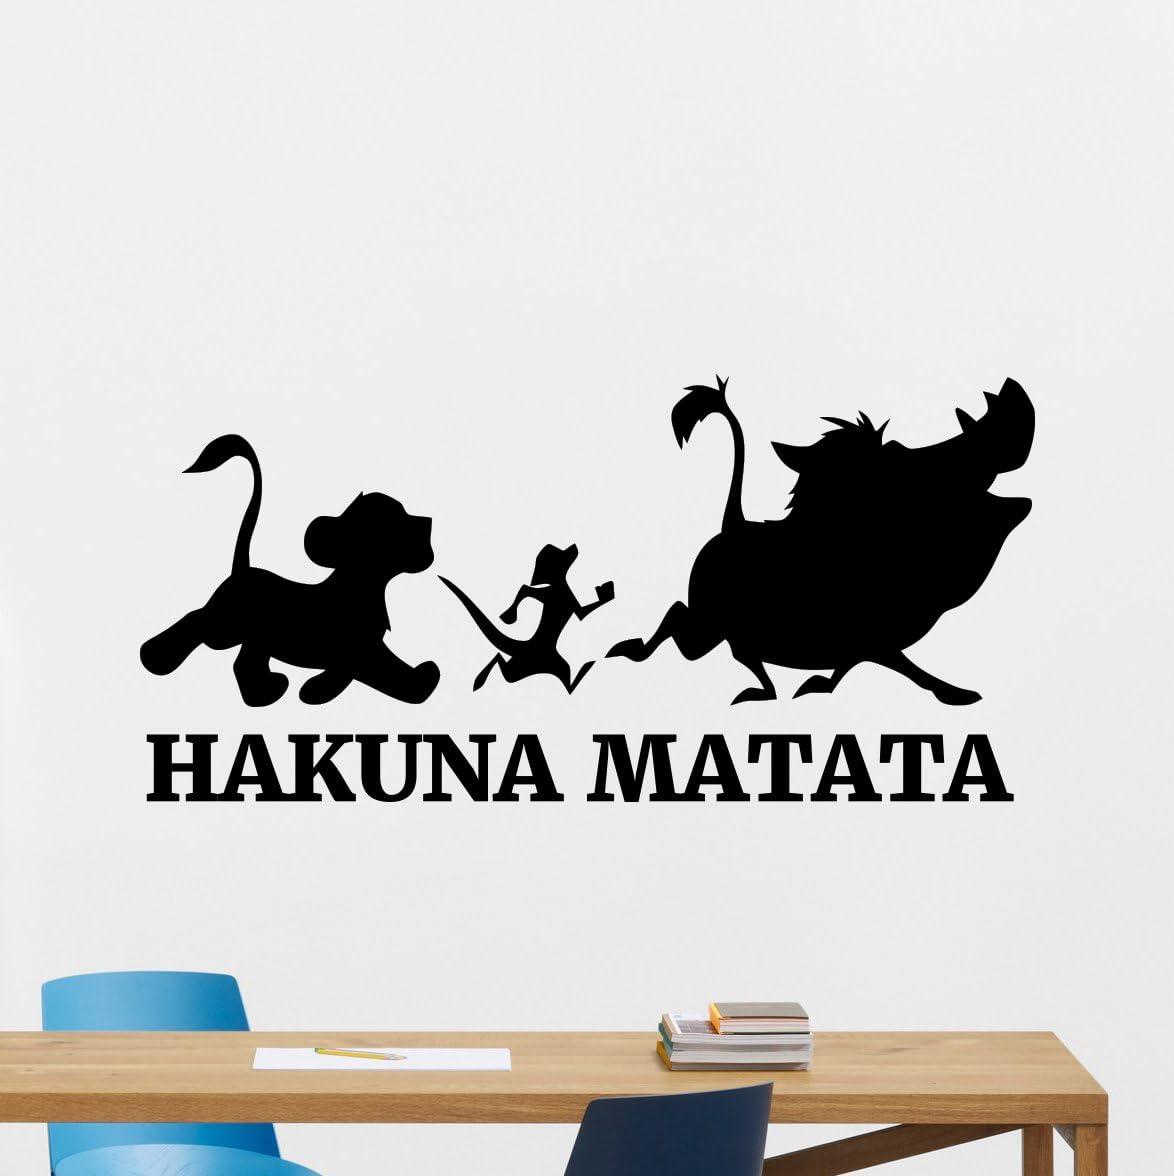 In This House..Hakuna Matata...We Do Disney-Vinyl Wall Decal-44H x 23W-Playroom Nursery Great room Wall Home Decor-Closet Decor